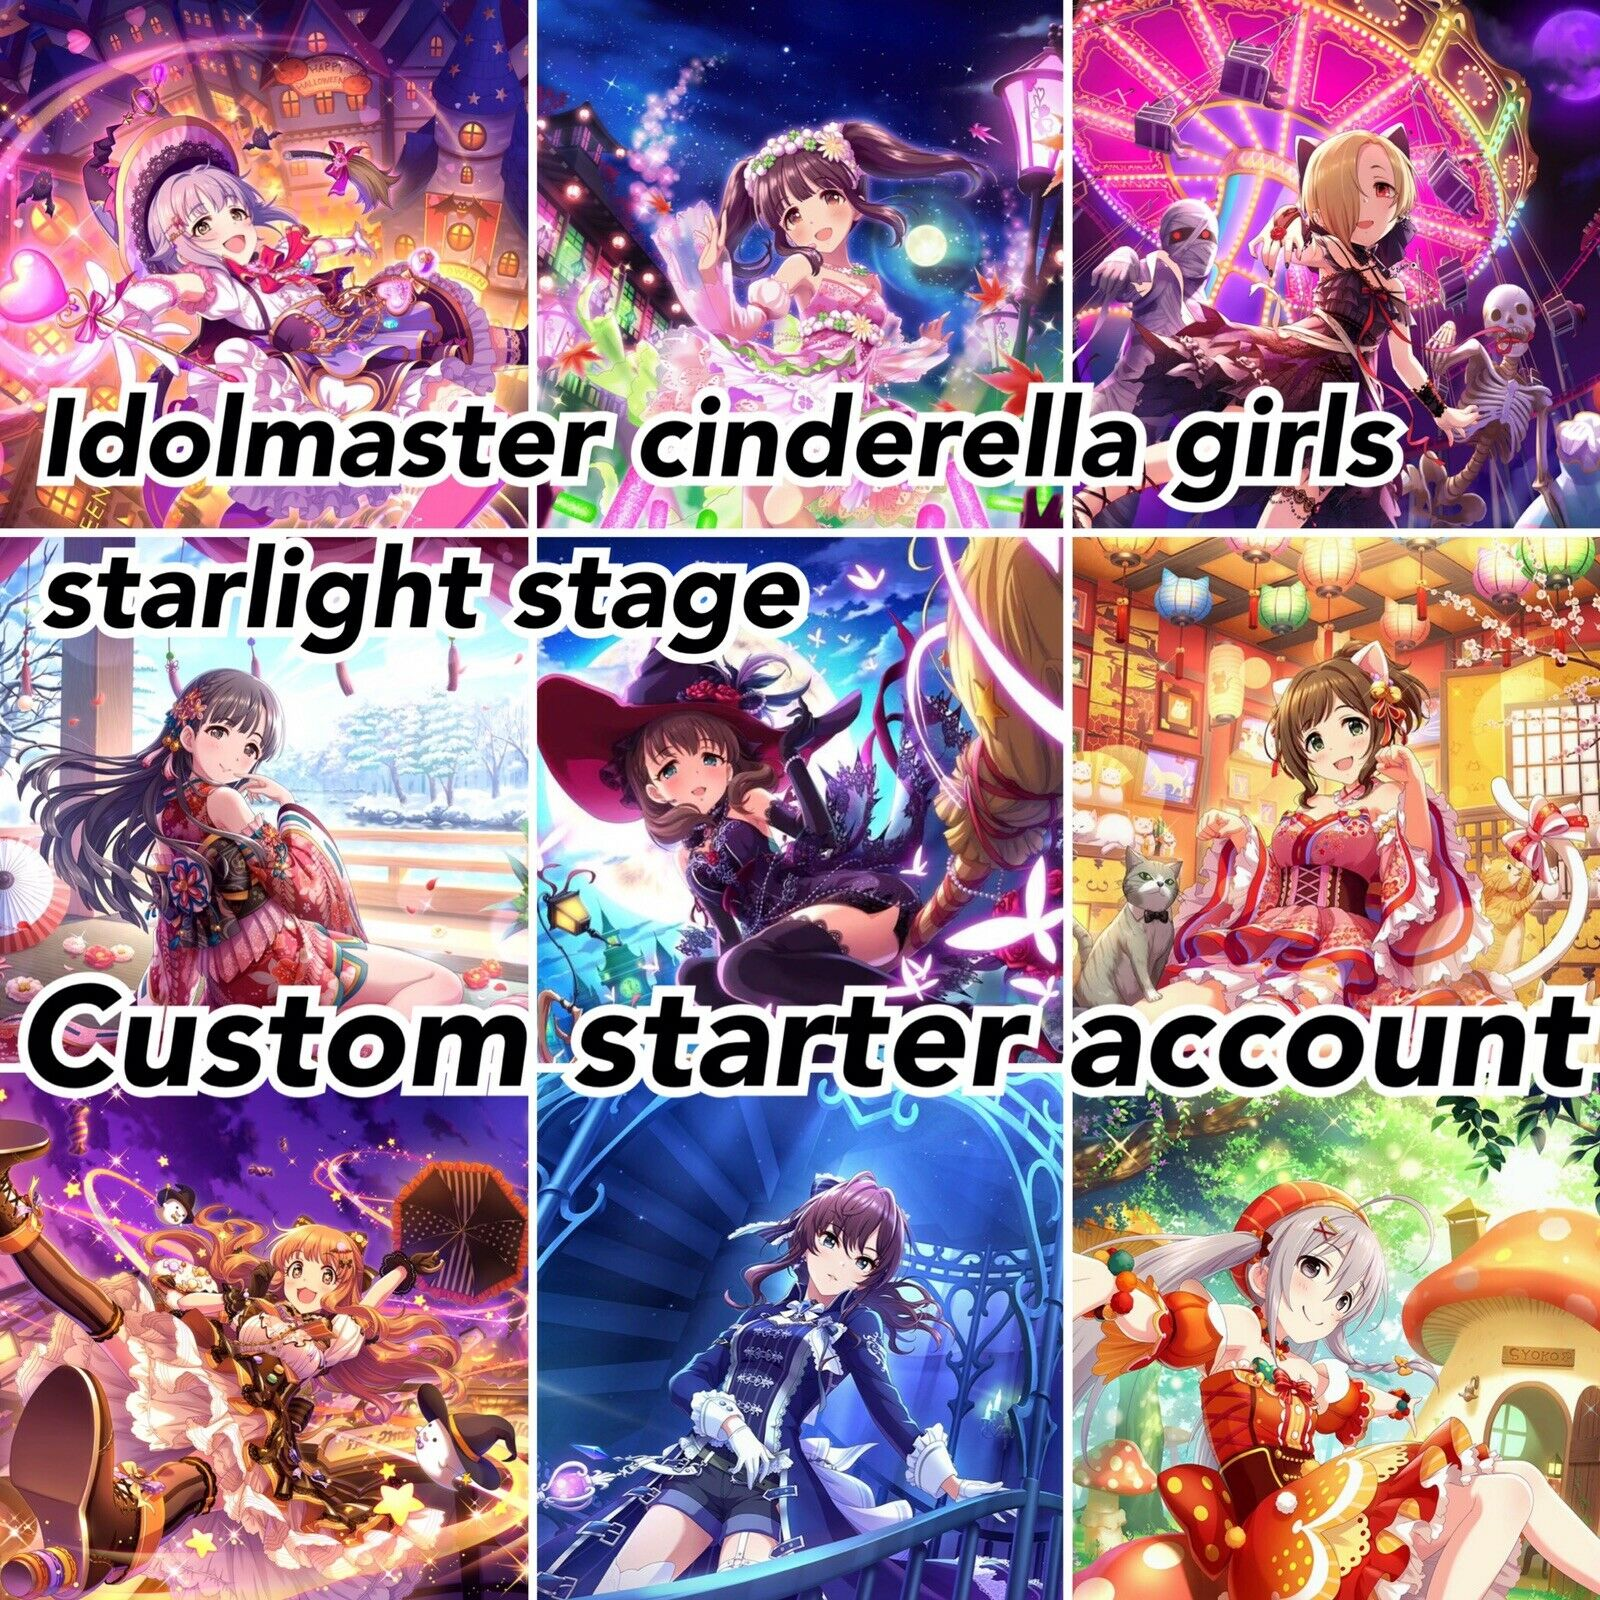 iDOLM@STER//idolmaster Cinderella Girls Starlight Stage CUSTOM starter account